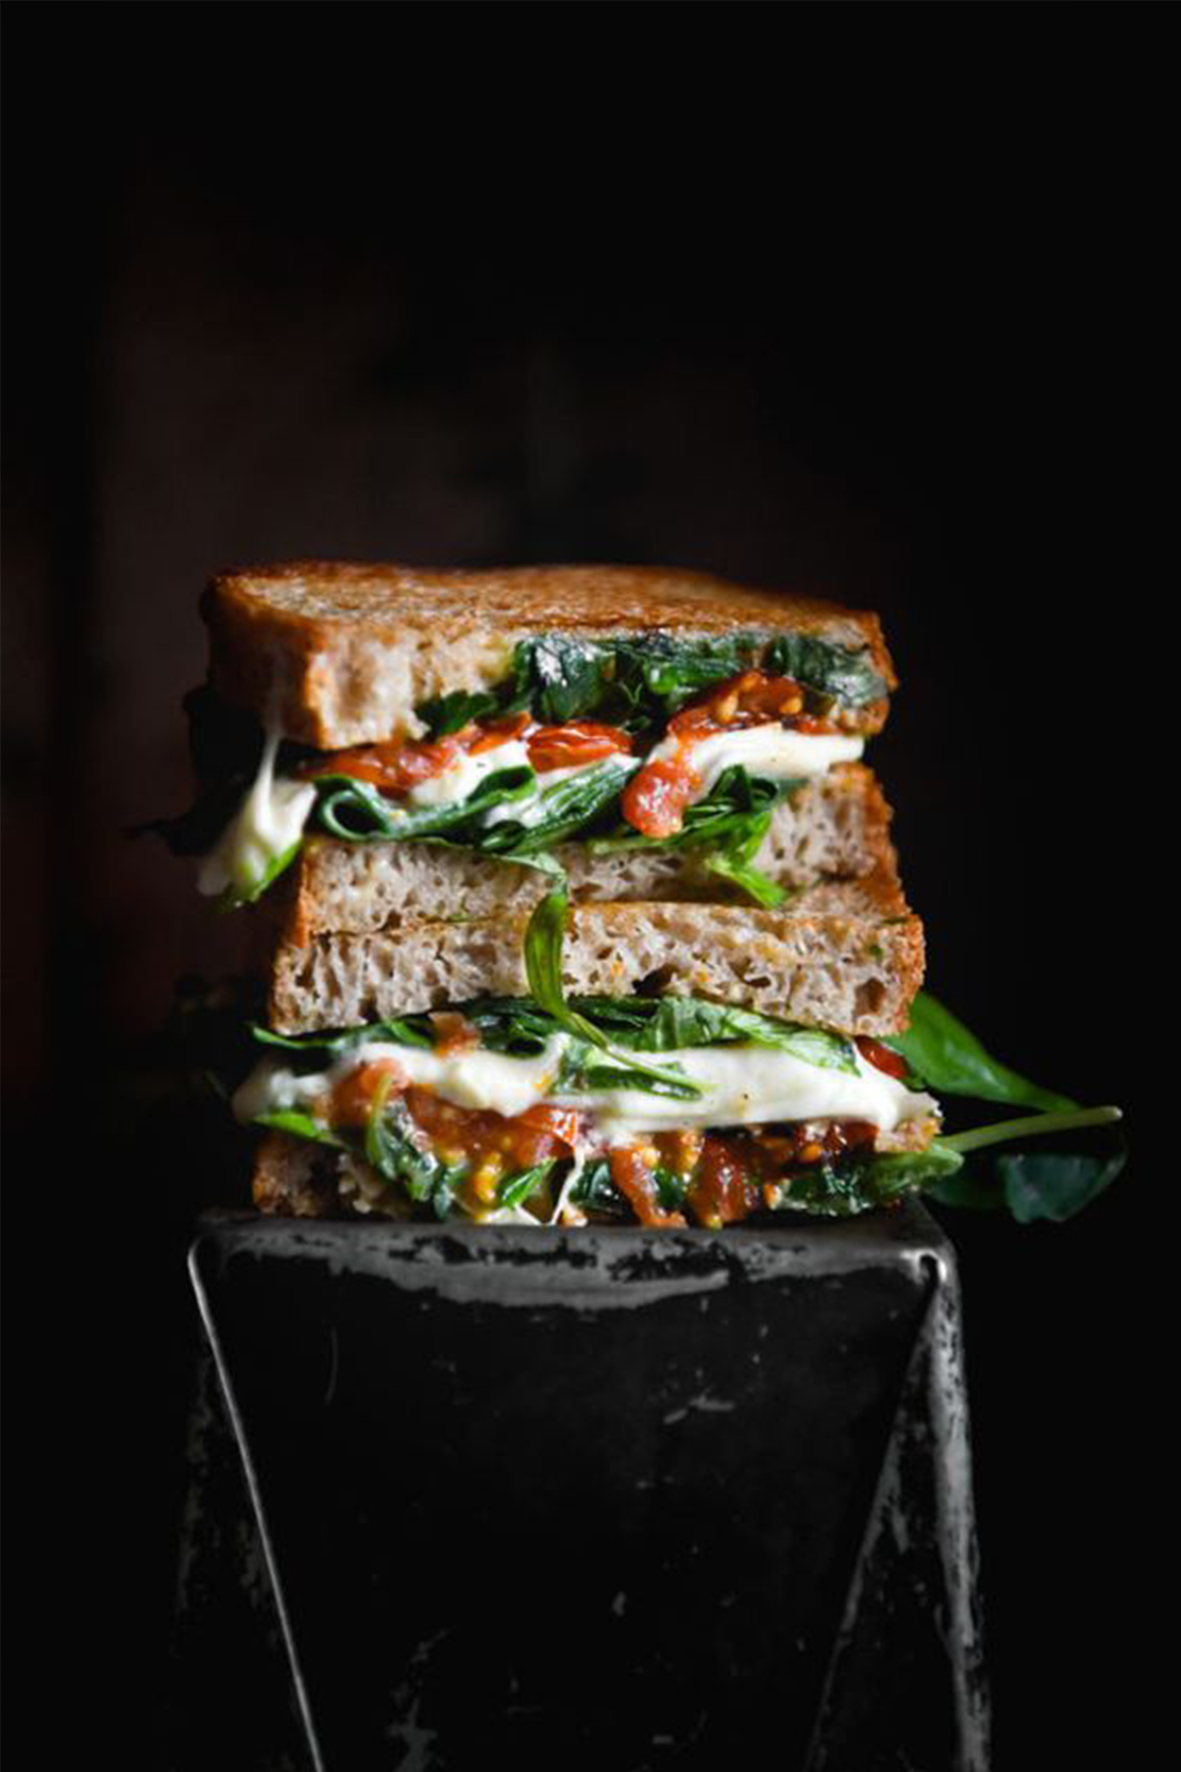 Sujets hauts_sandwich